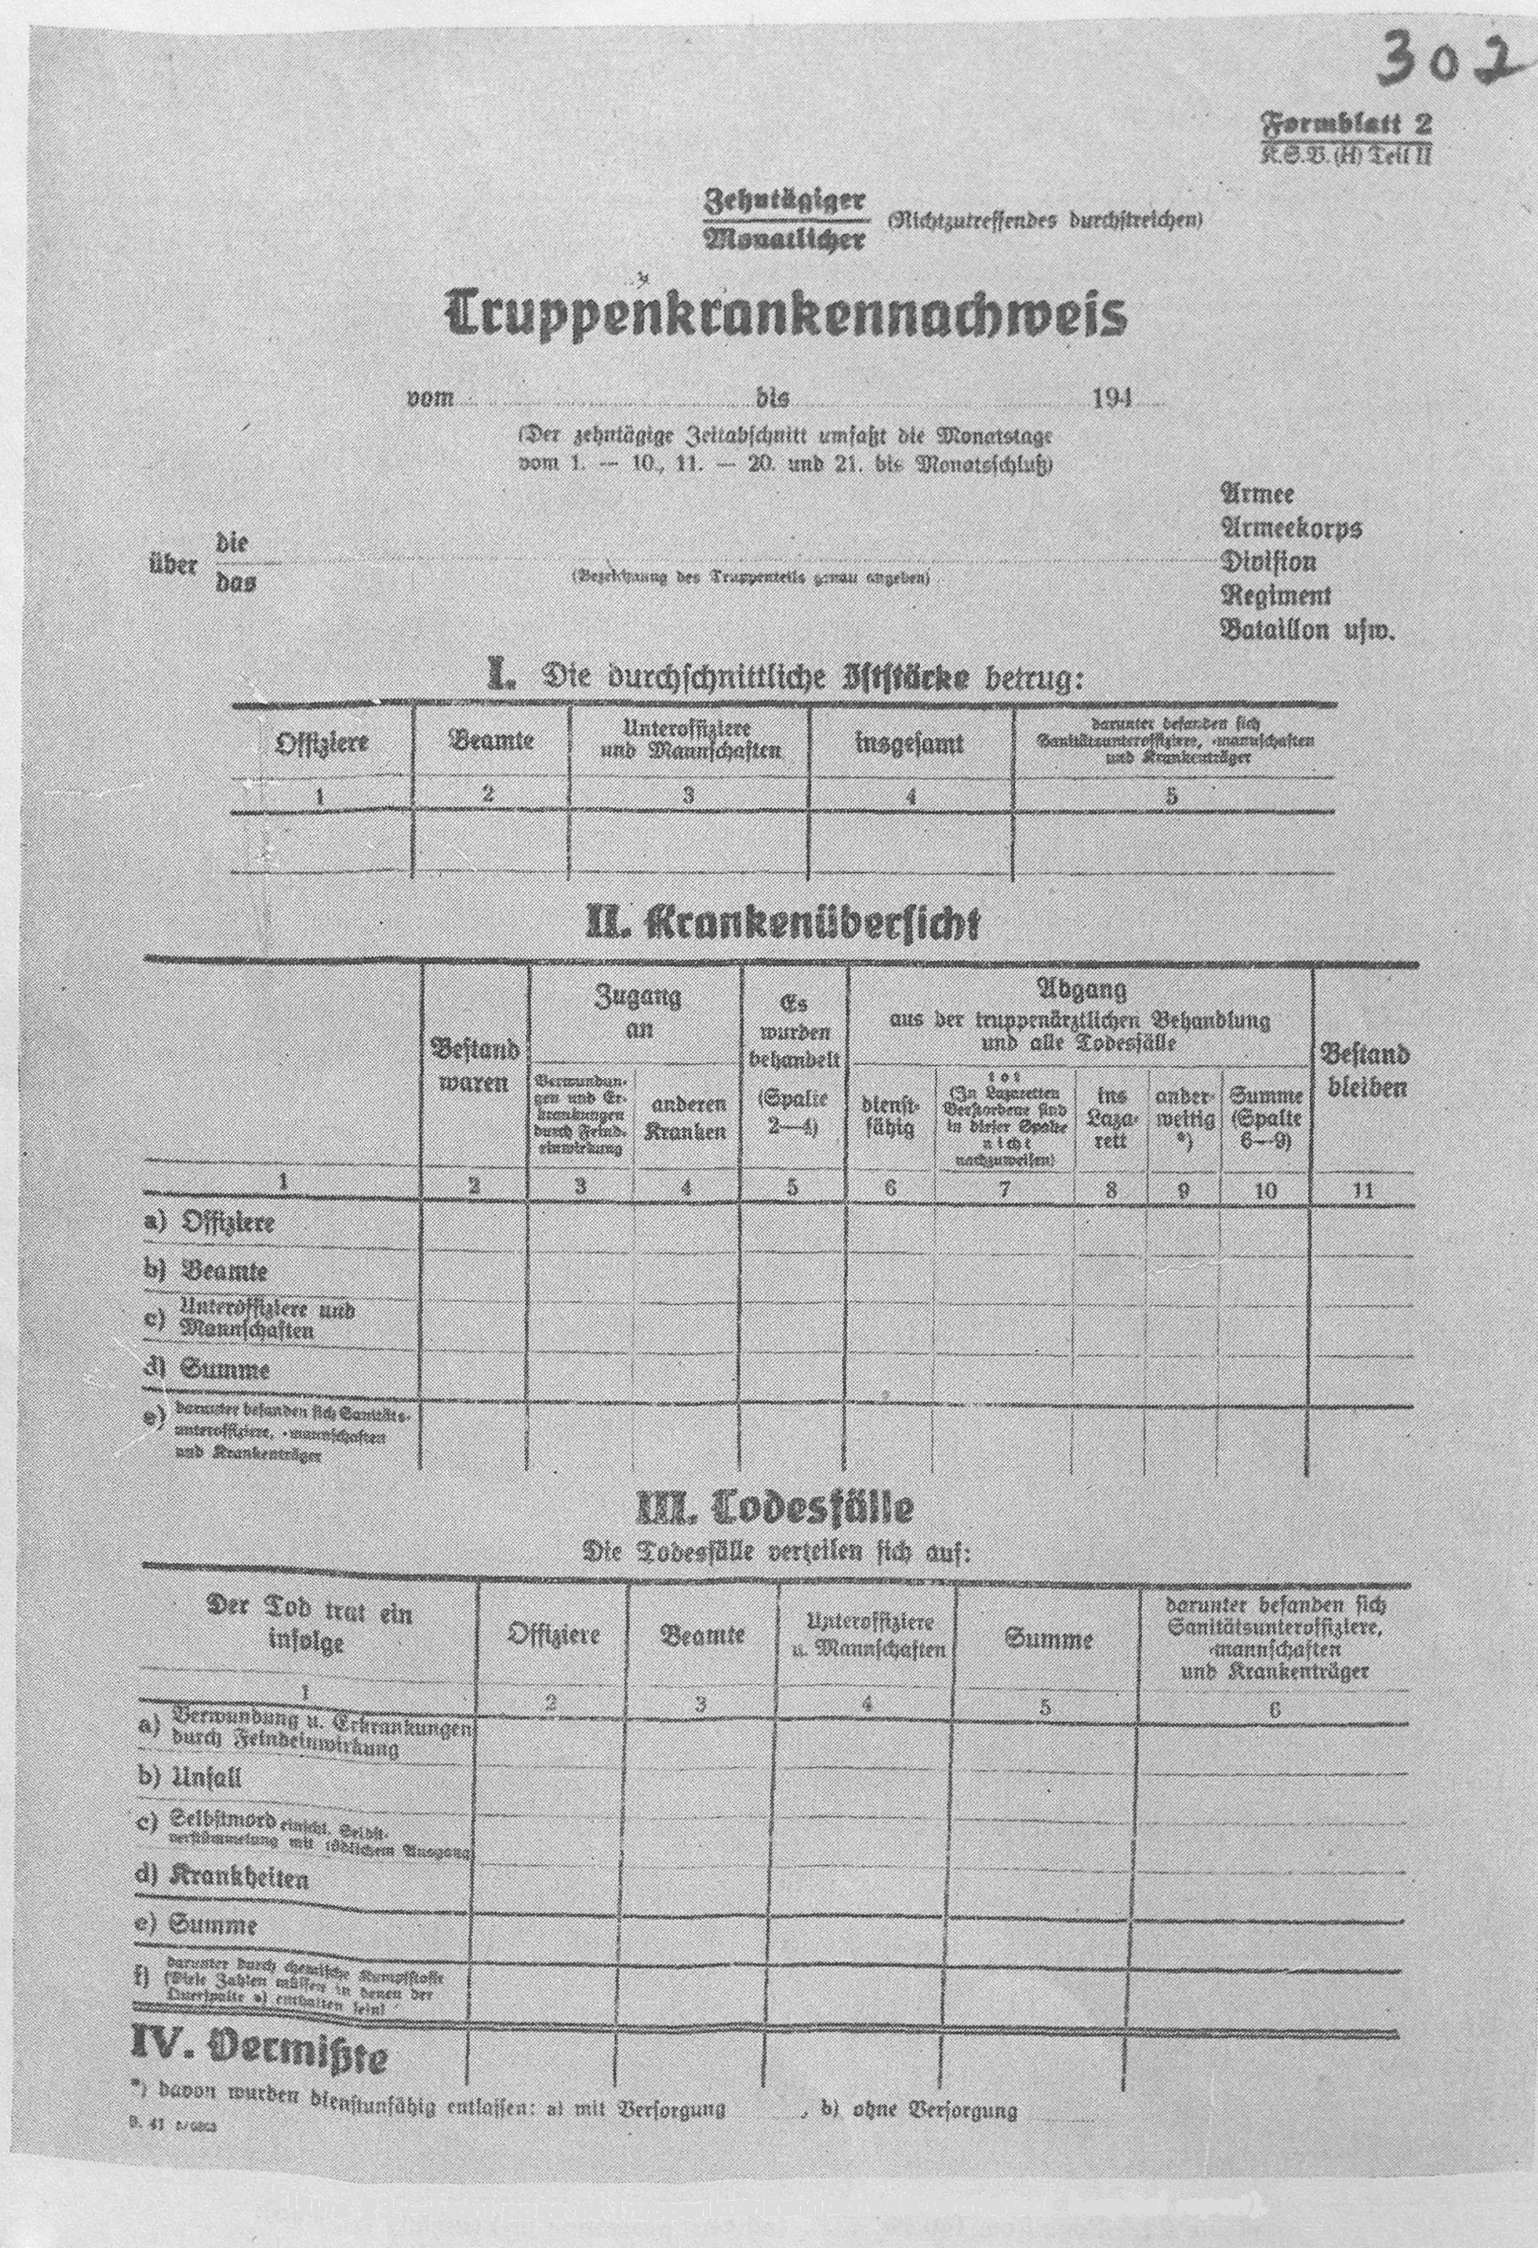 THE EXPLOITATION OF GERMAN DOCUMENTS